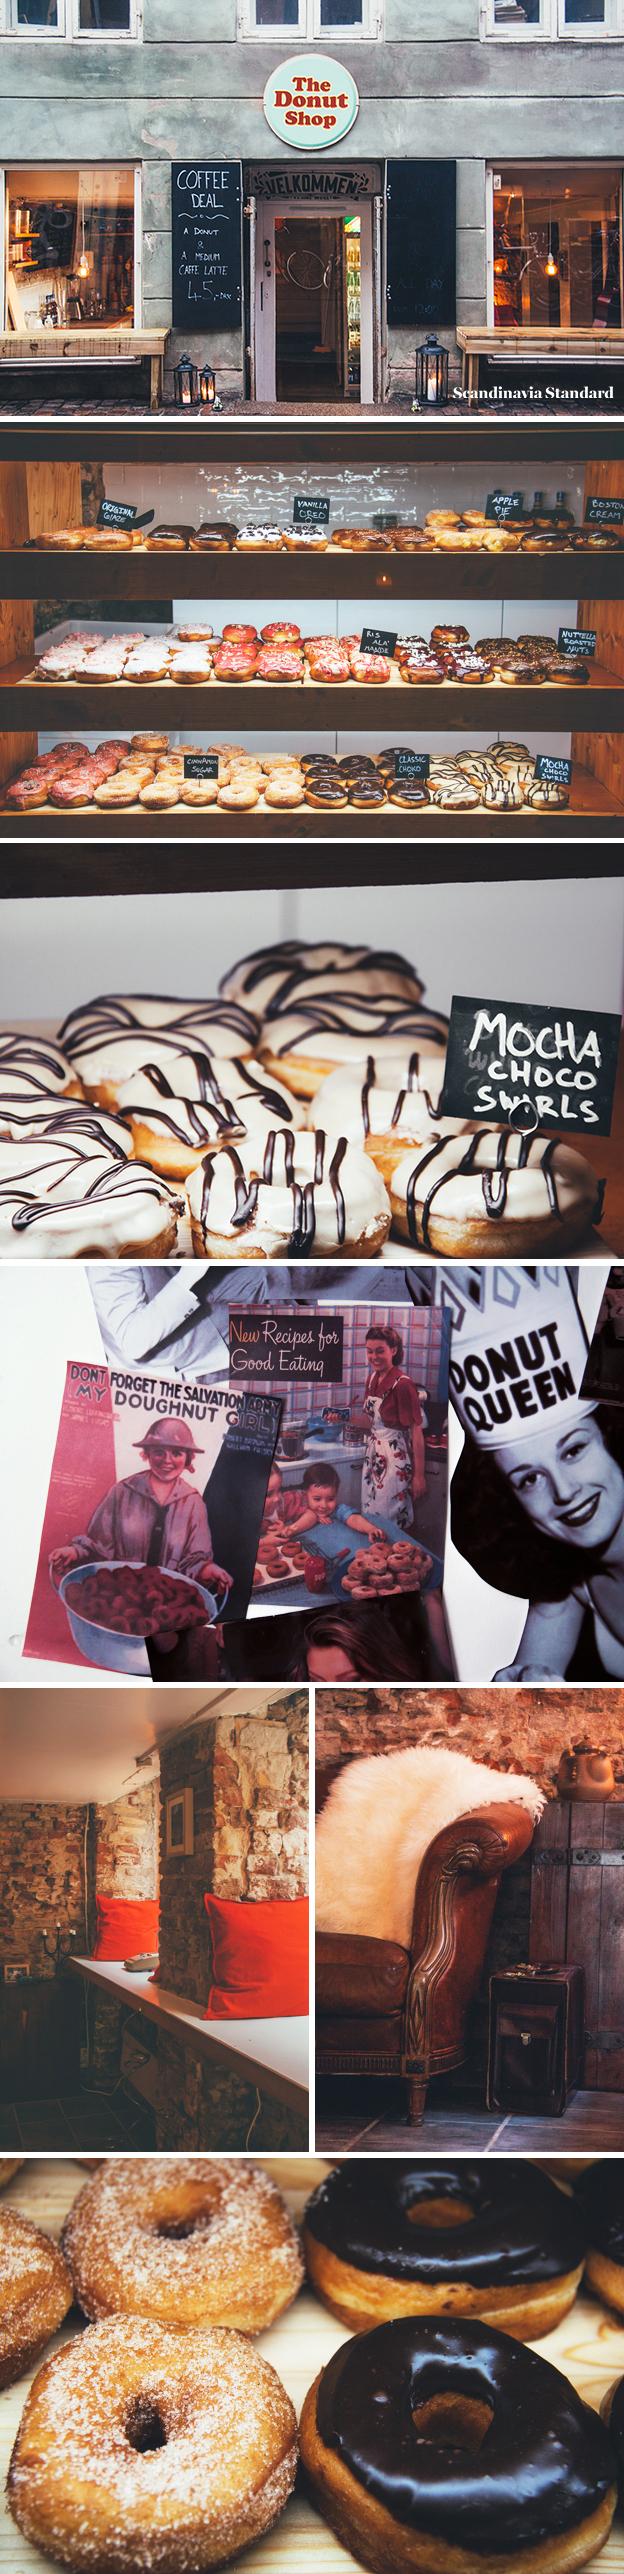 donut-shop-collage-copenhagen-scandinavia-standard